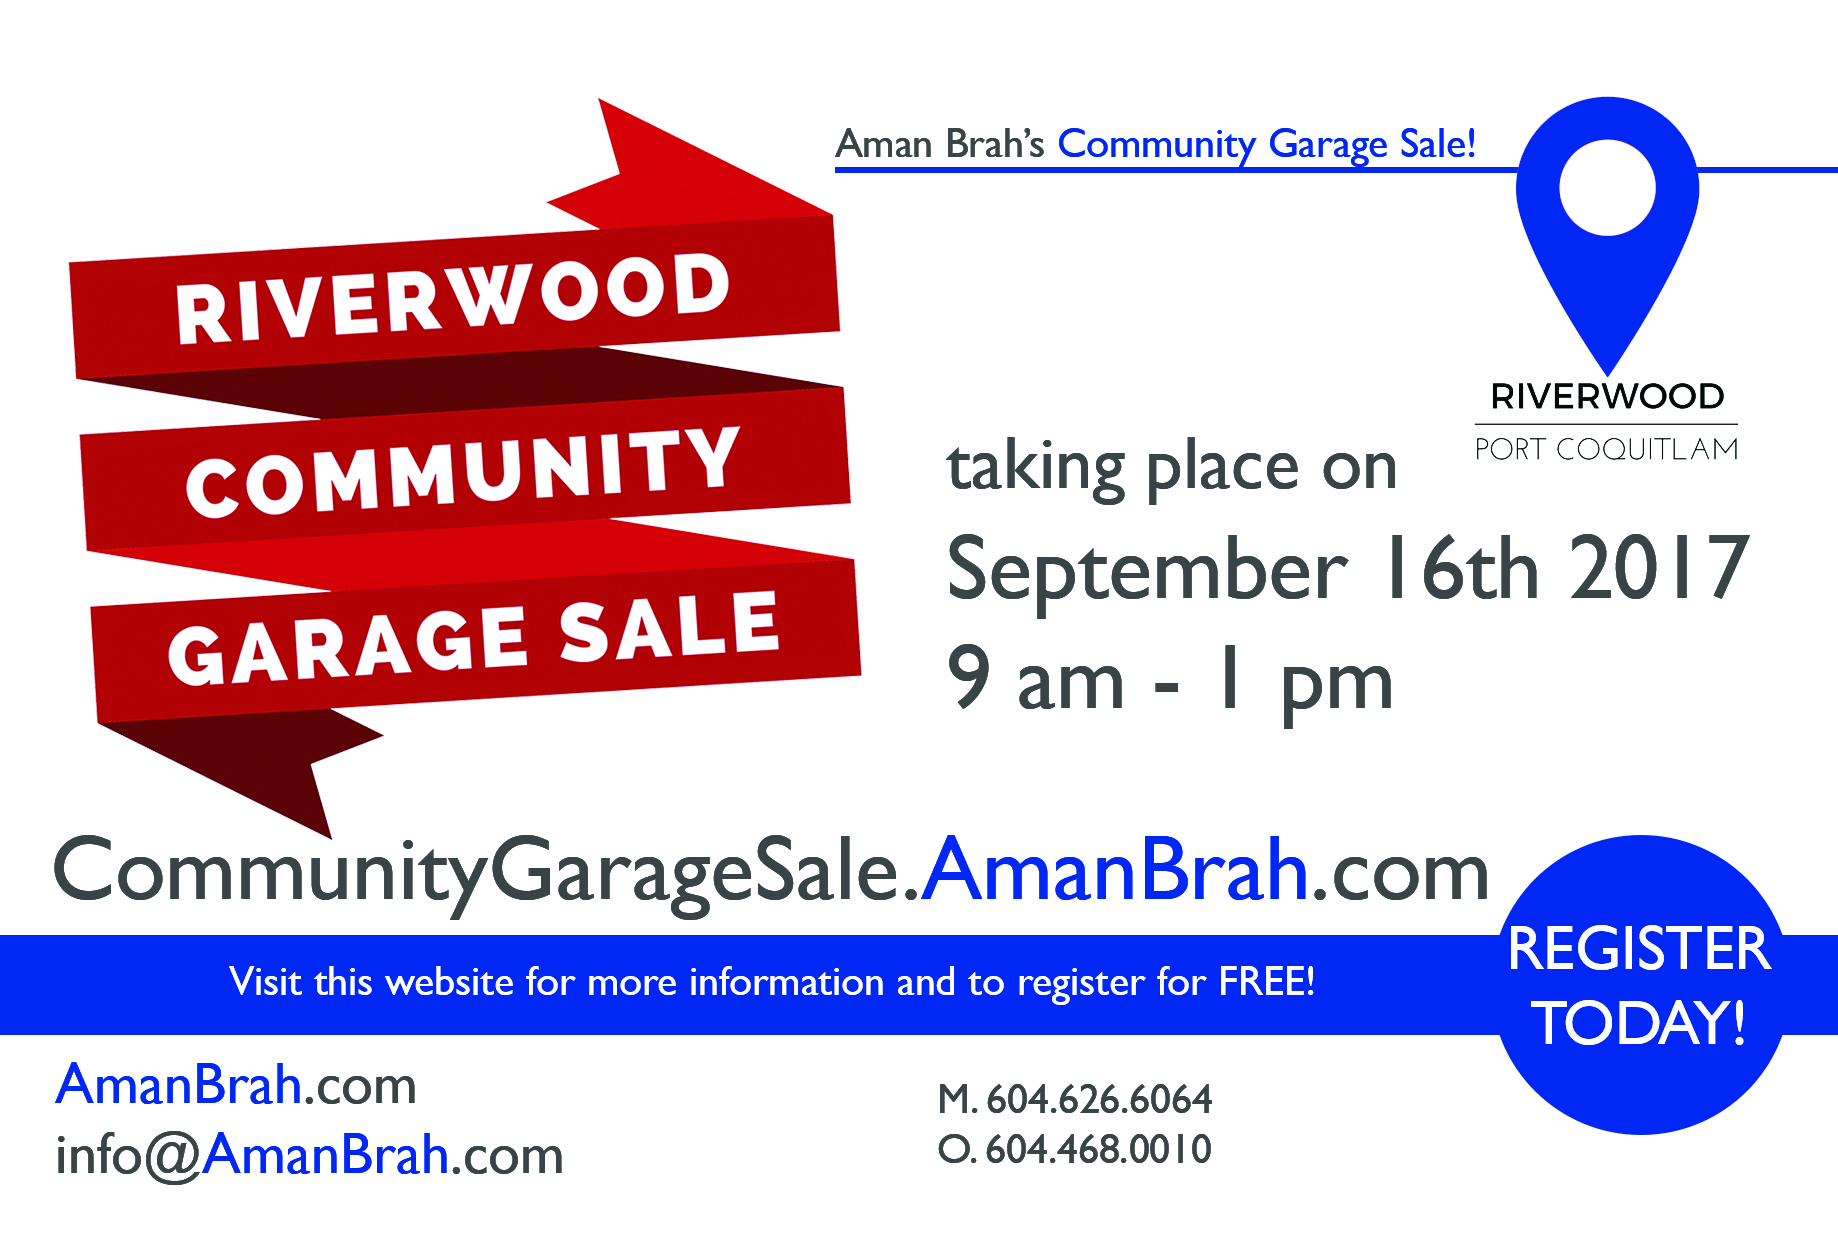 Riverwood Community Garage Sale 2017